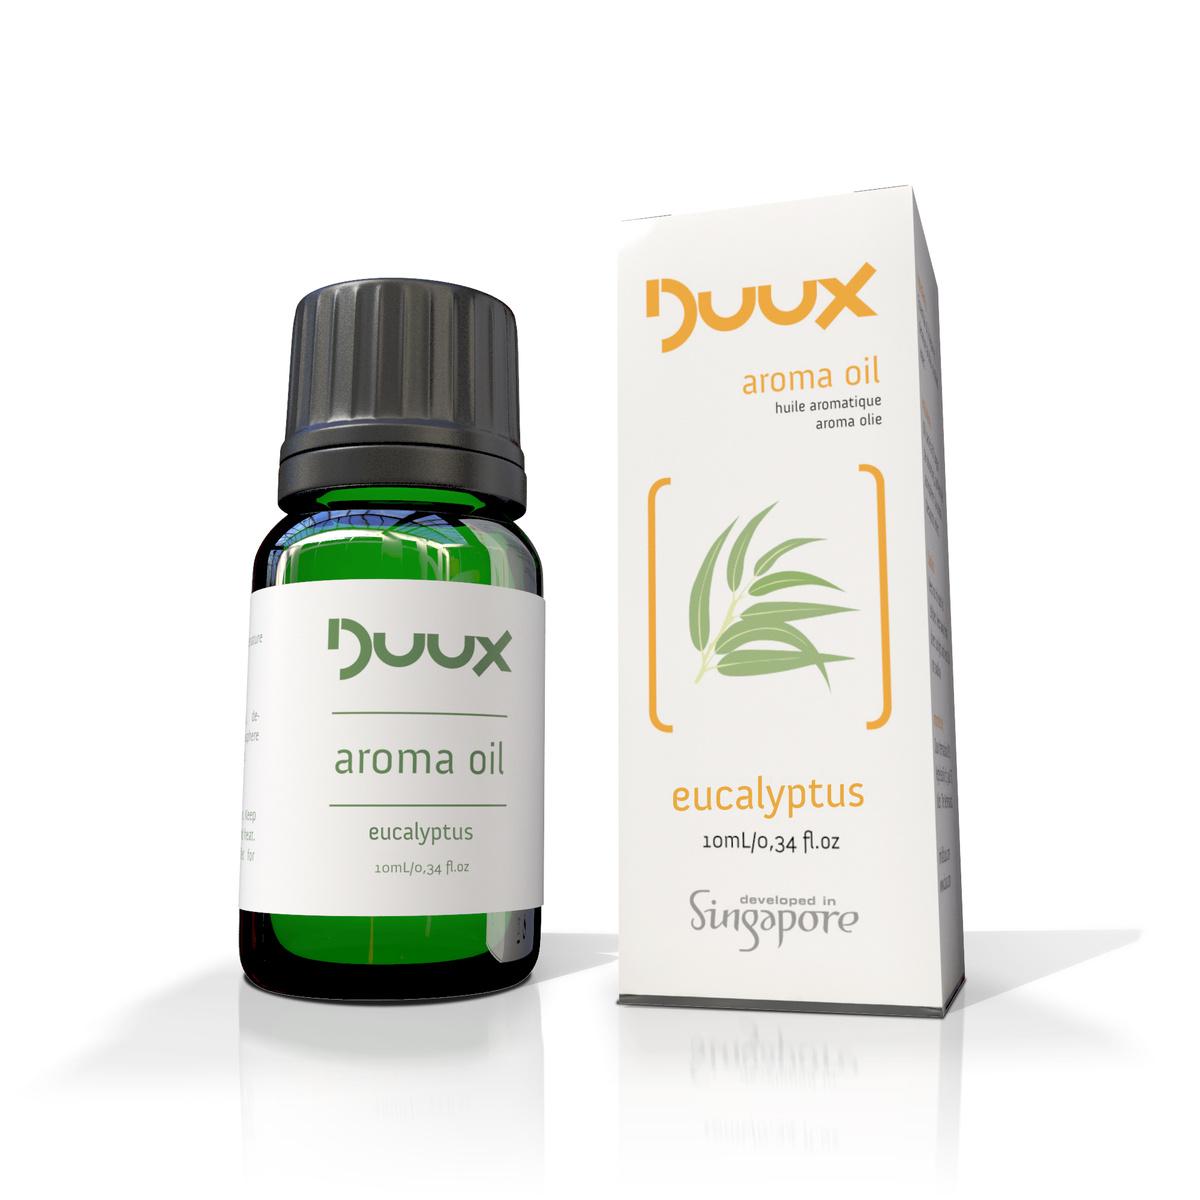 Maxx Duux aróma olej Eucalyptus - pre čističku,